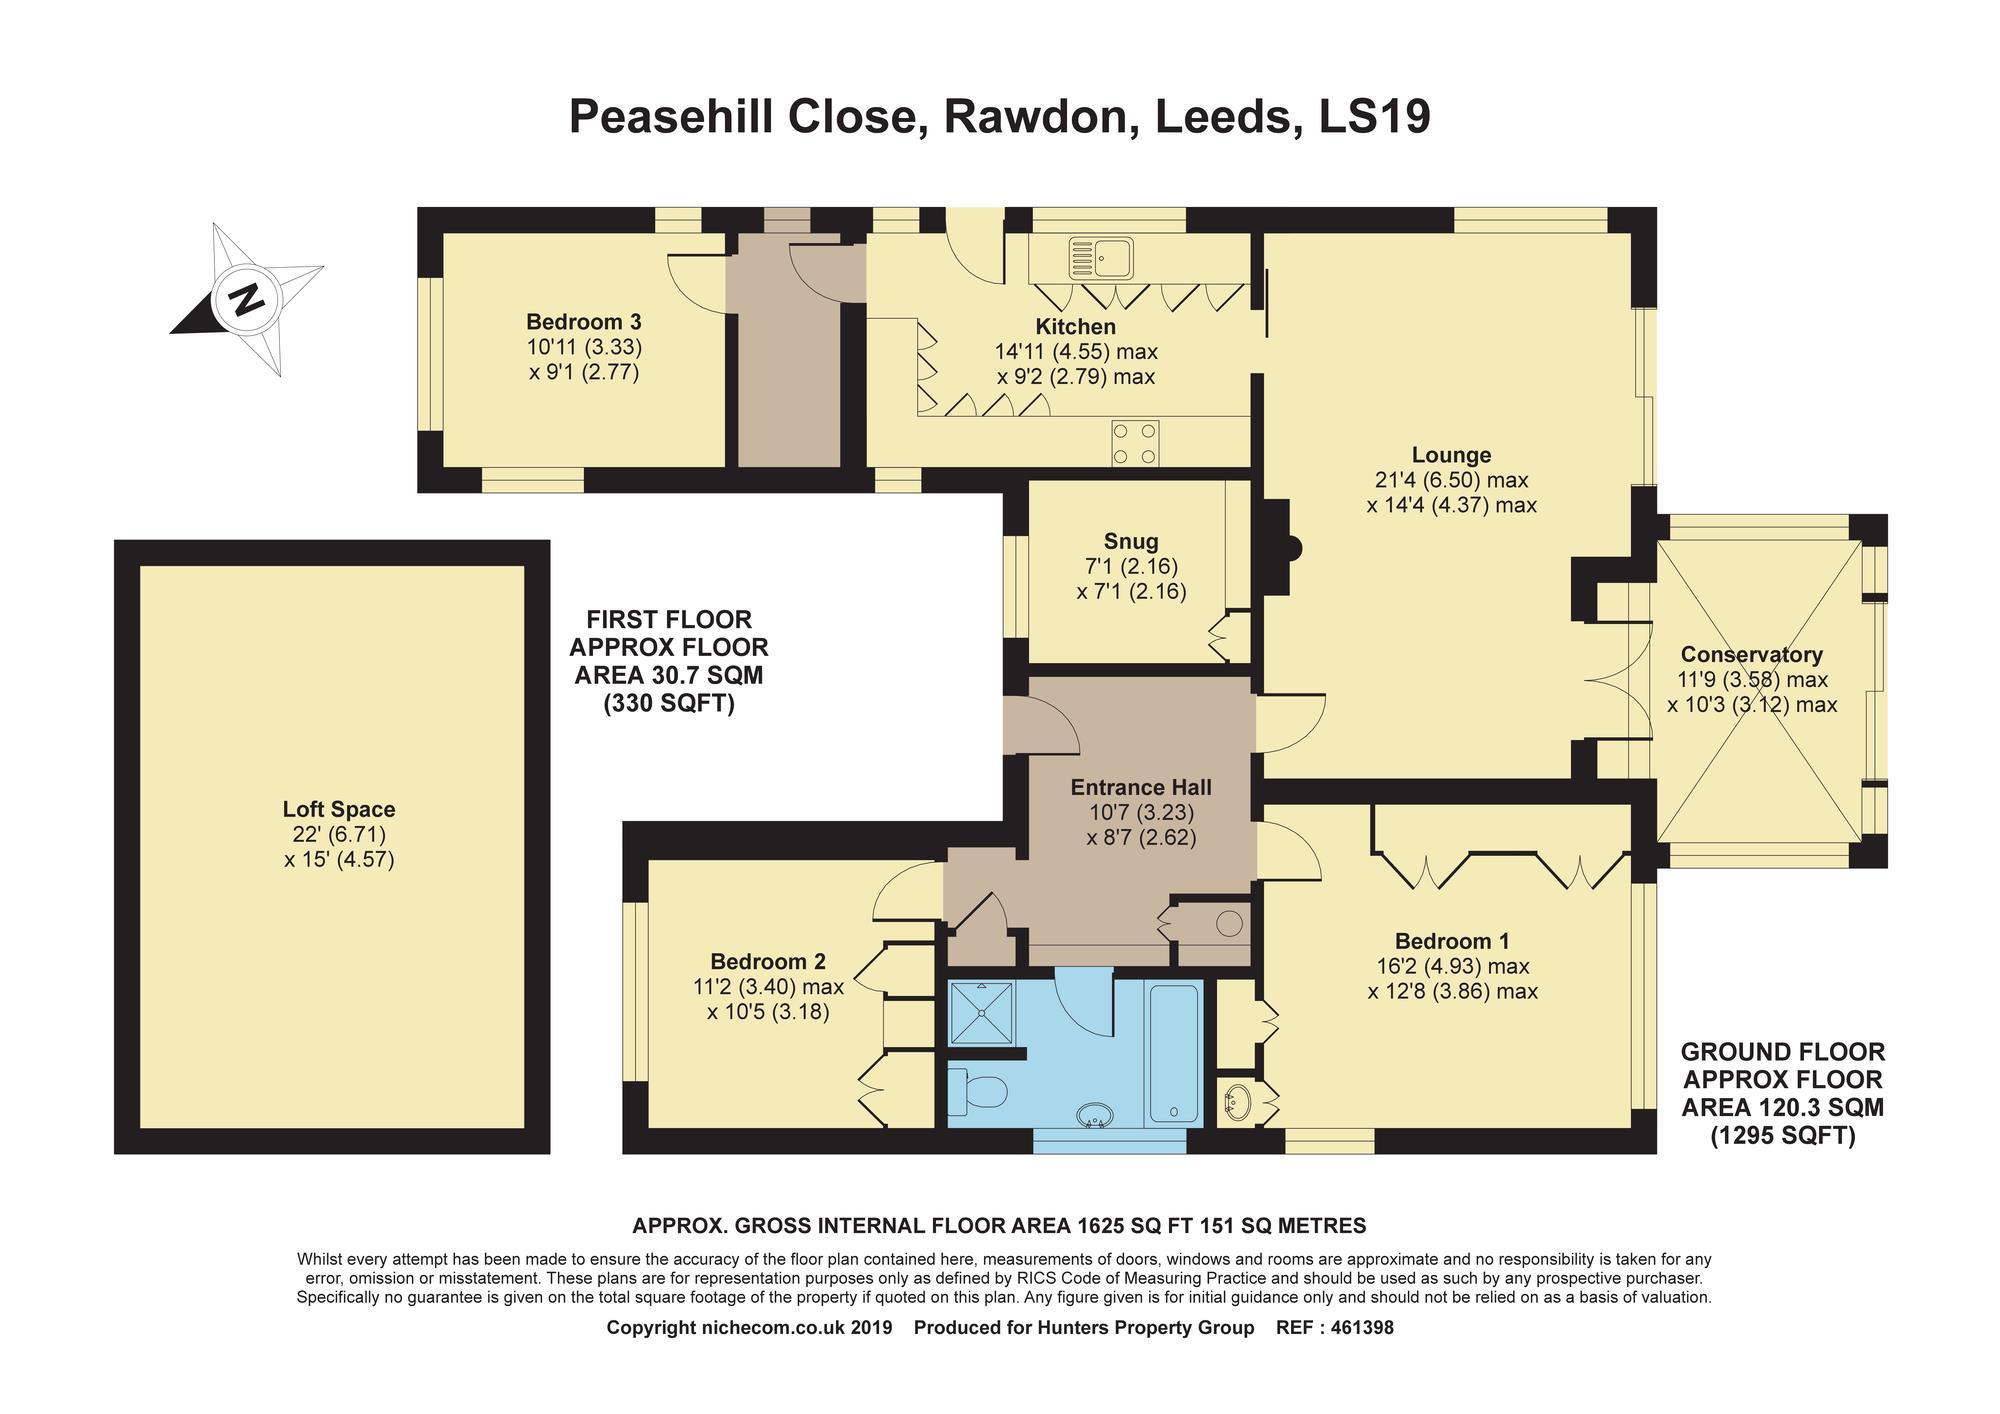 3 Bedrooms Detached bungalow for sale in Peasehill Close, Rawdon, Leeds LS19